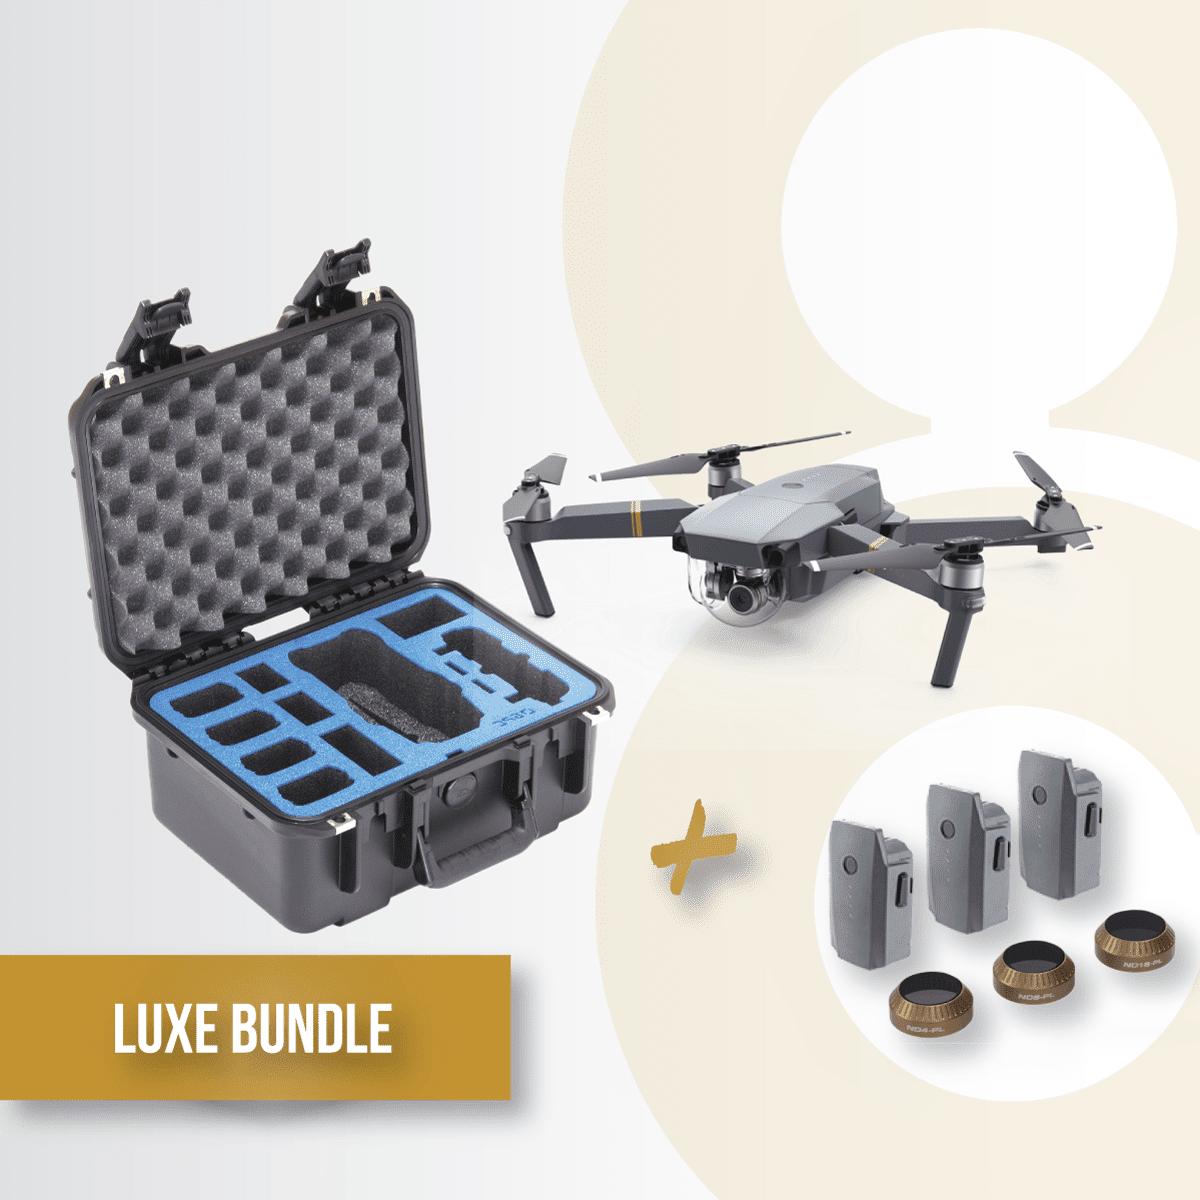 Bundle-gold-Mavic-gpc-case-hard-battery-reote-dji-lens-kit-polarpro-filters